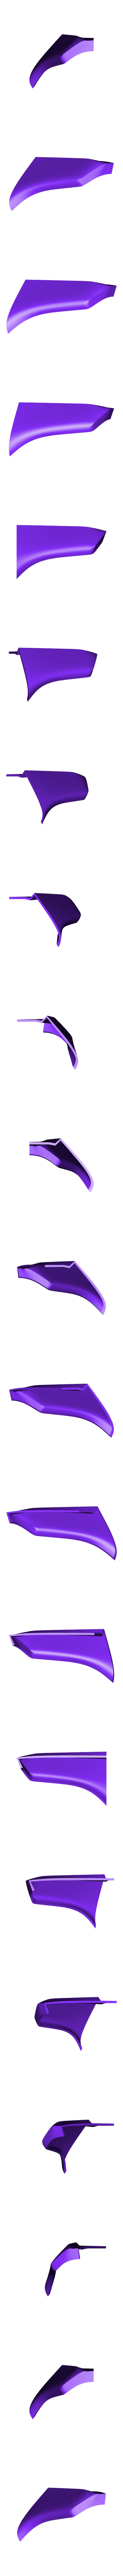 Part_5_v2.stl Download free STL file Kotor Sith Mask Star Wars • 3D printing model, VillainousPropShop